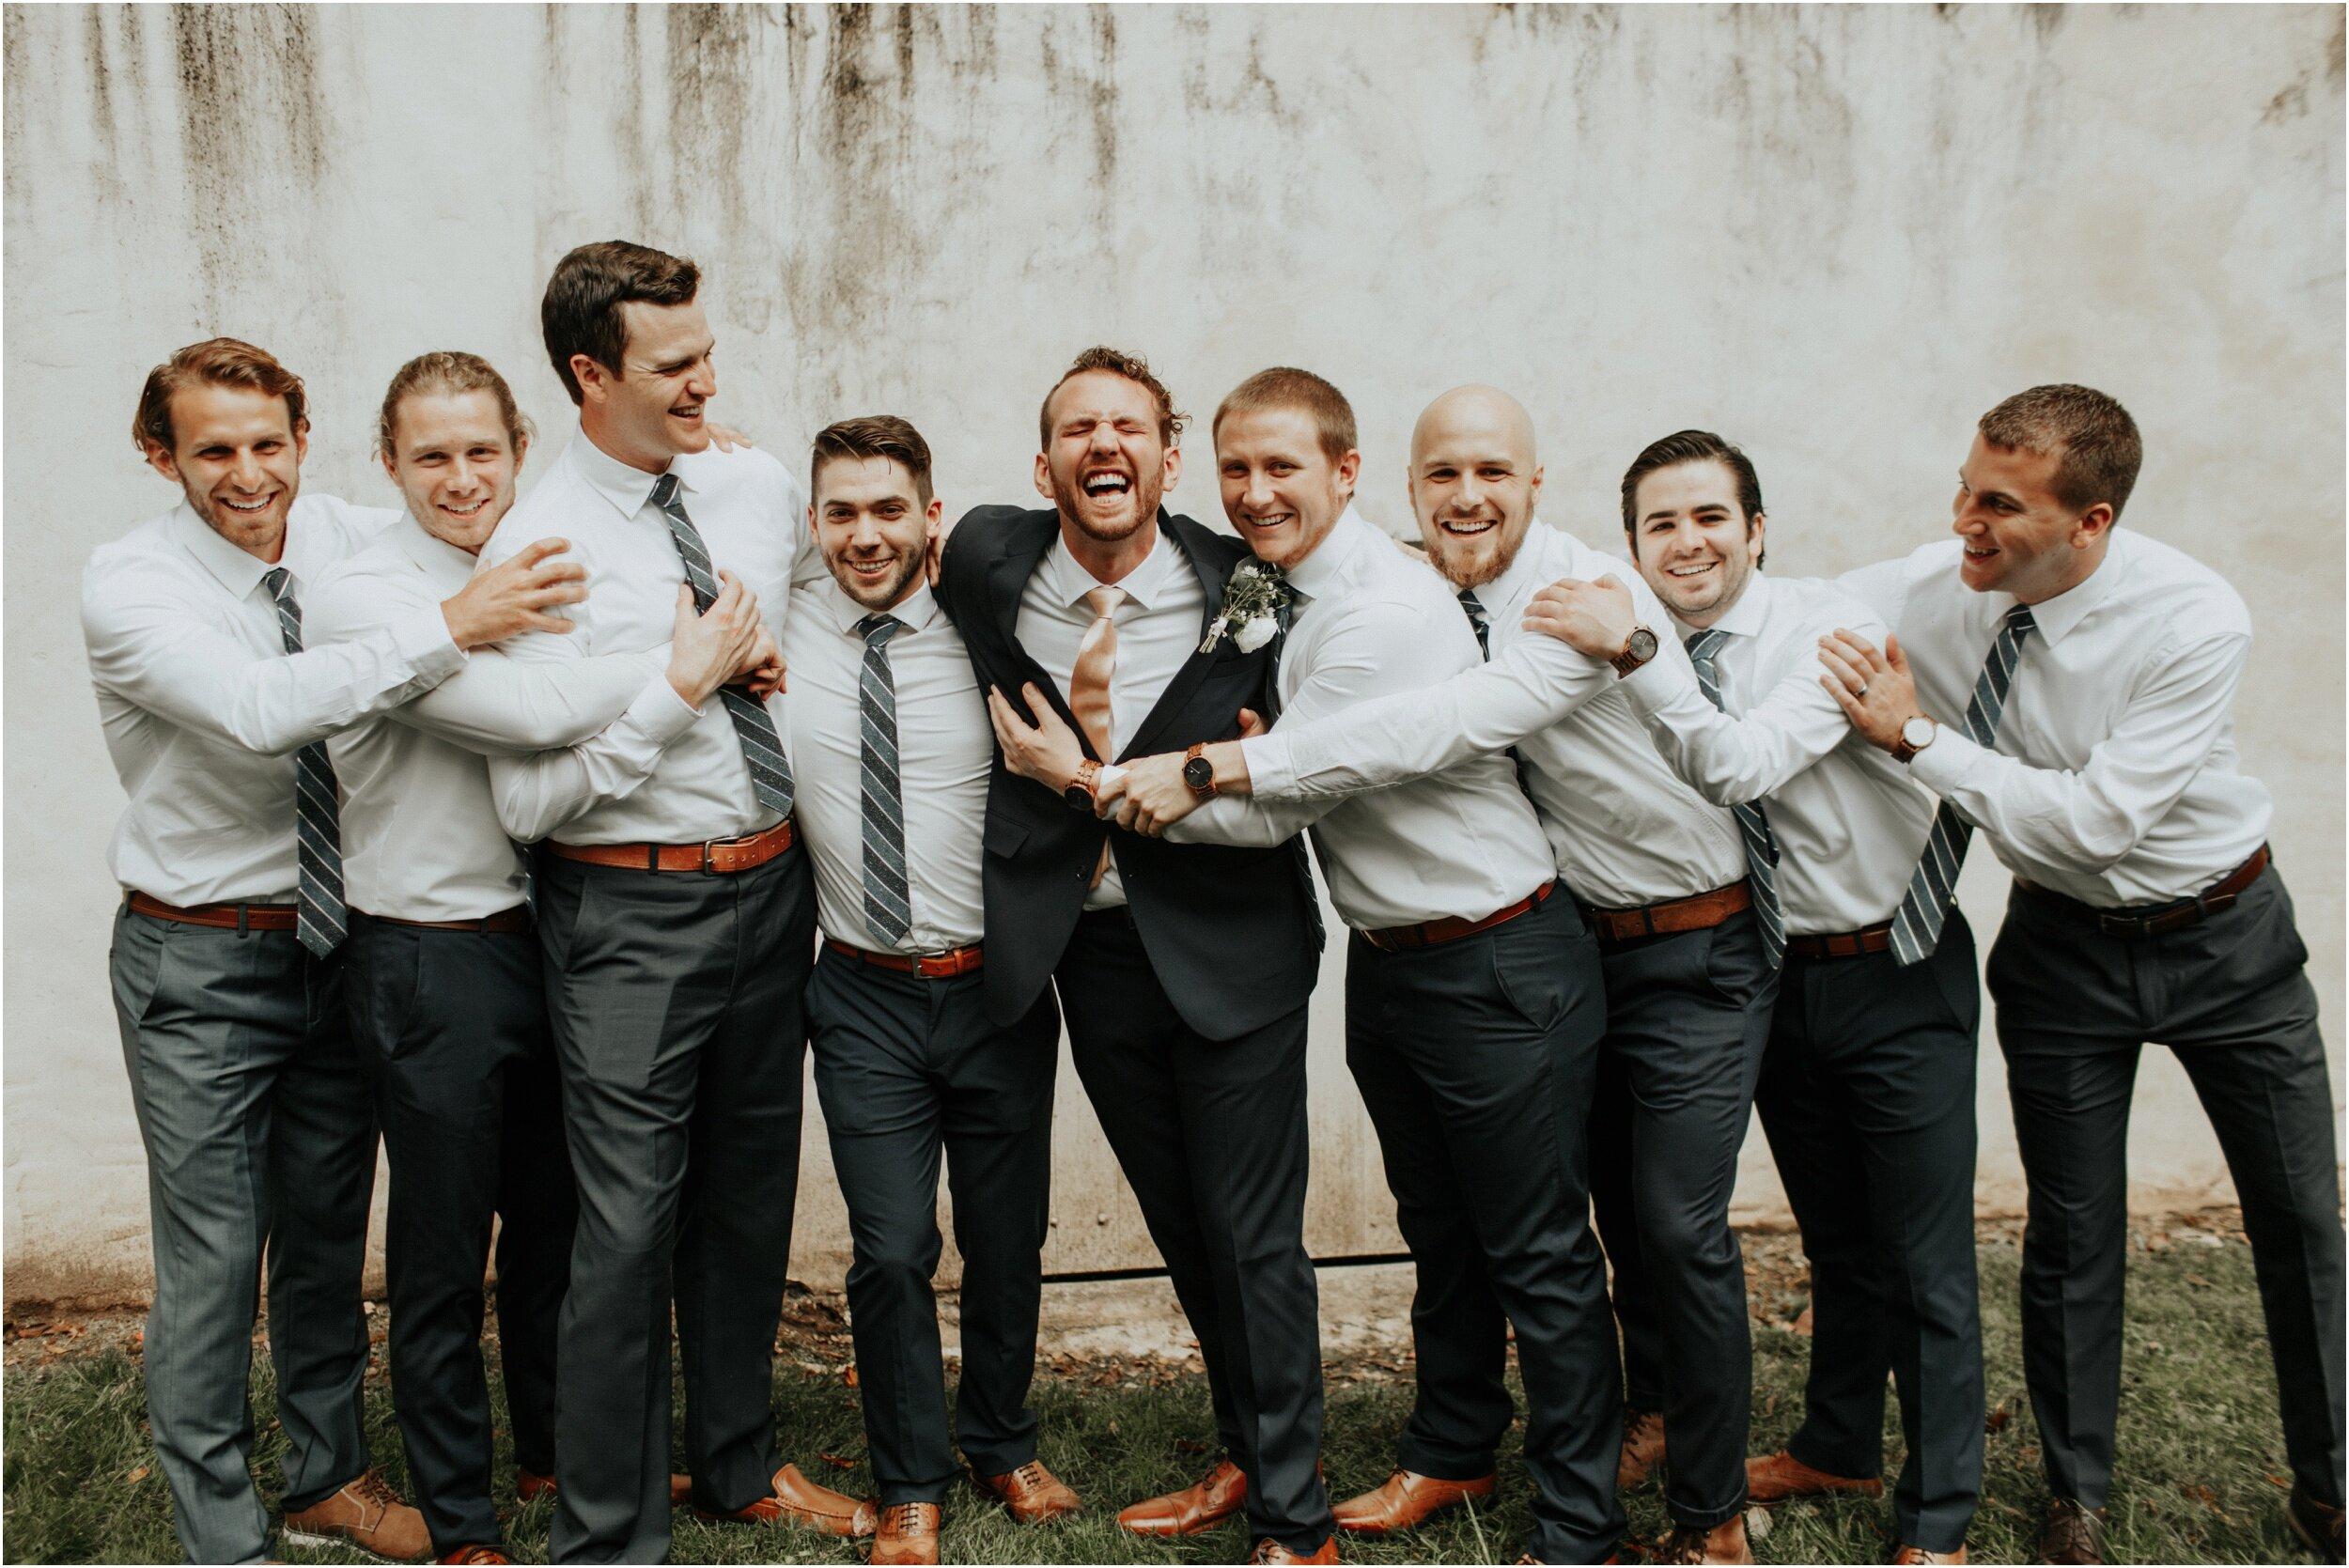 steph-and-jordan-cox-our-wedding-historic-shady-lane-compass-wedding-collective-hazel-lining-photography-destination-elopement-wedding-engagement-photography_0042.jpg